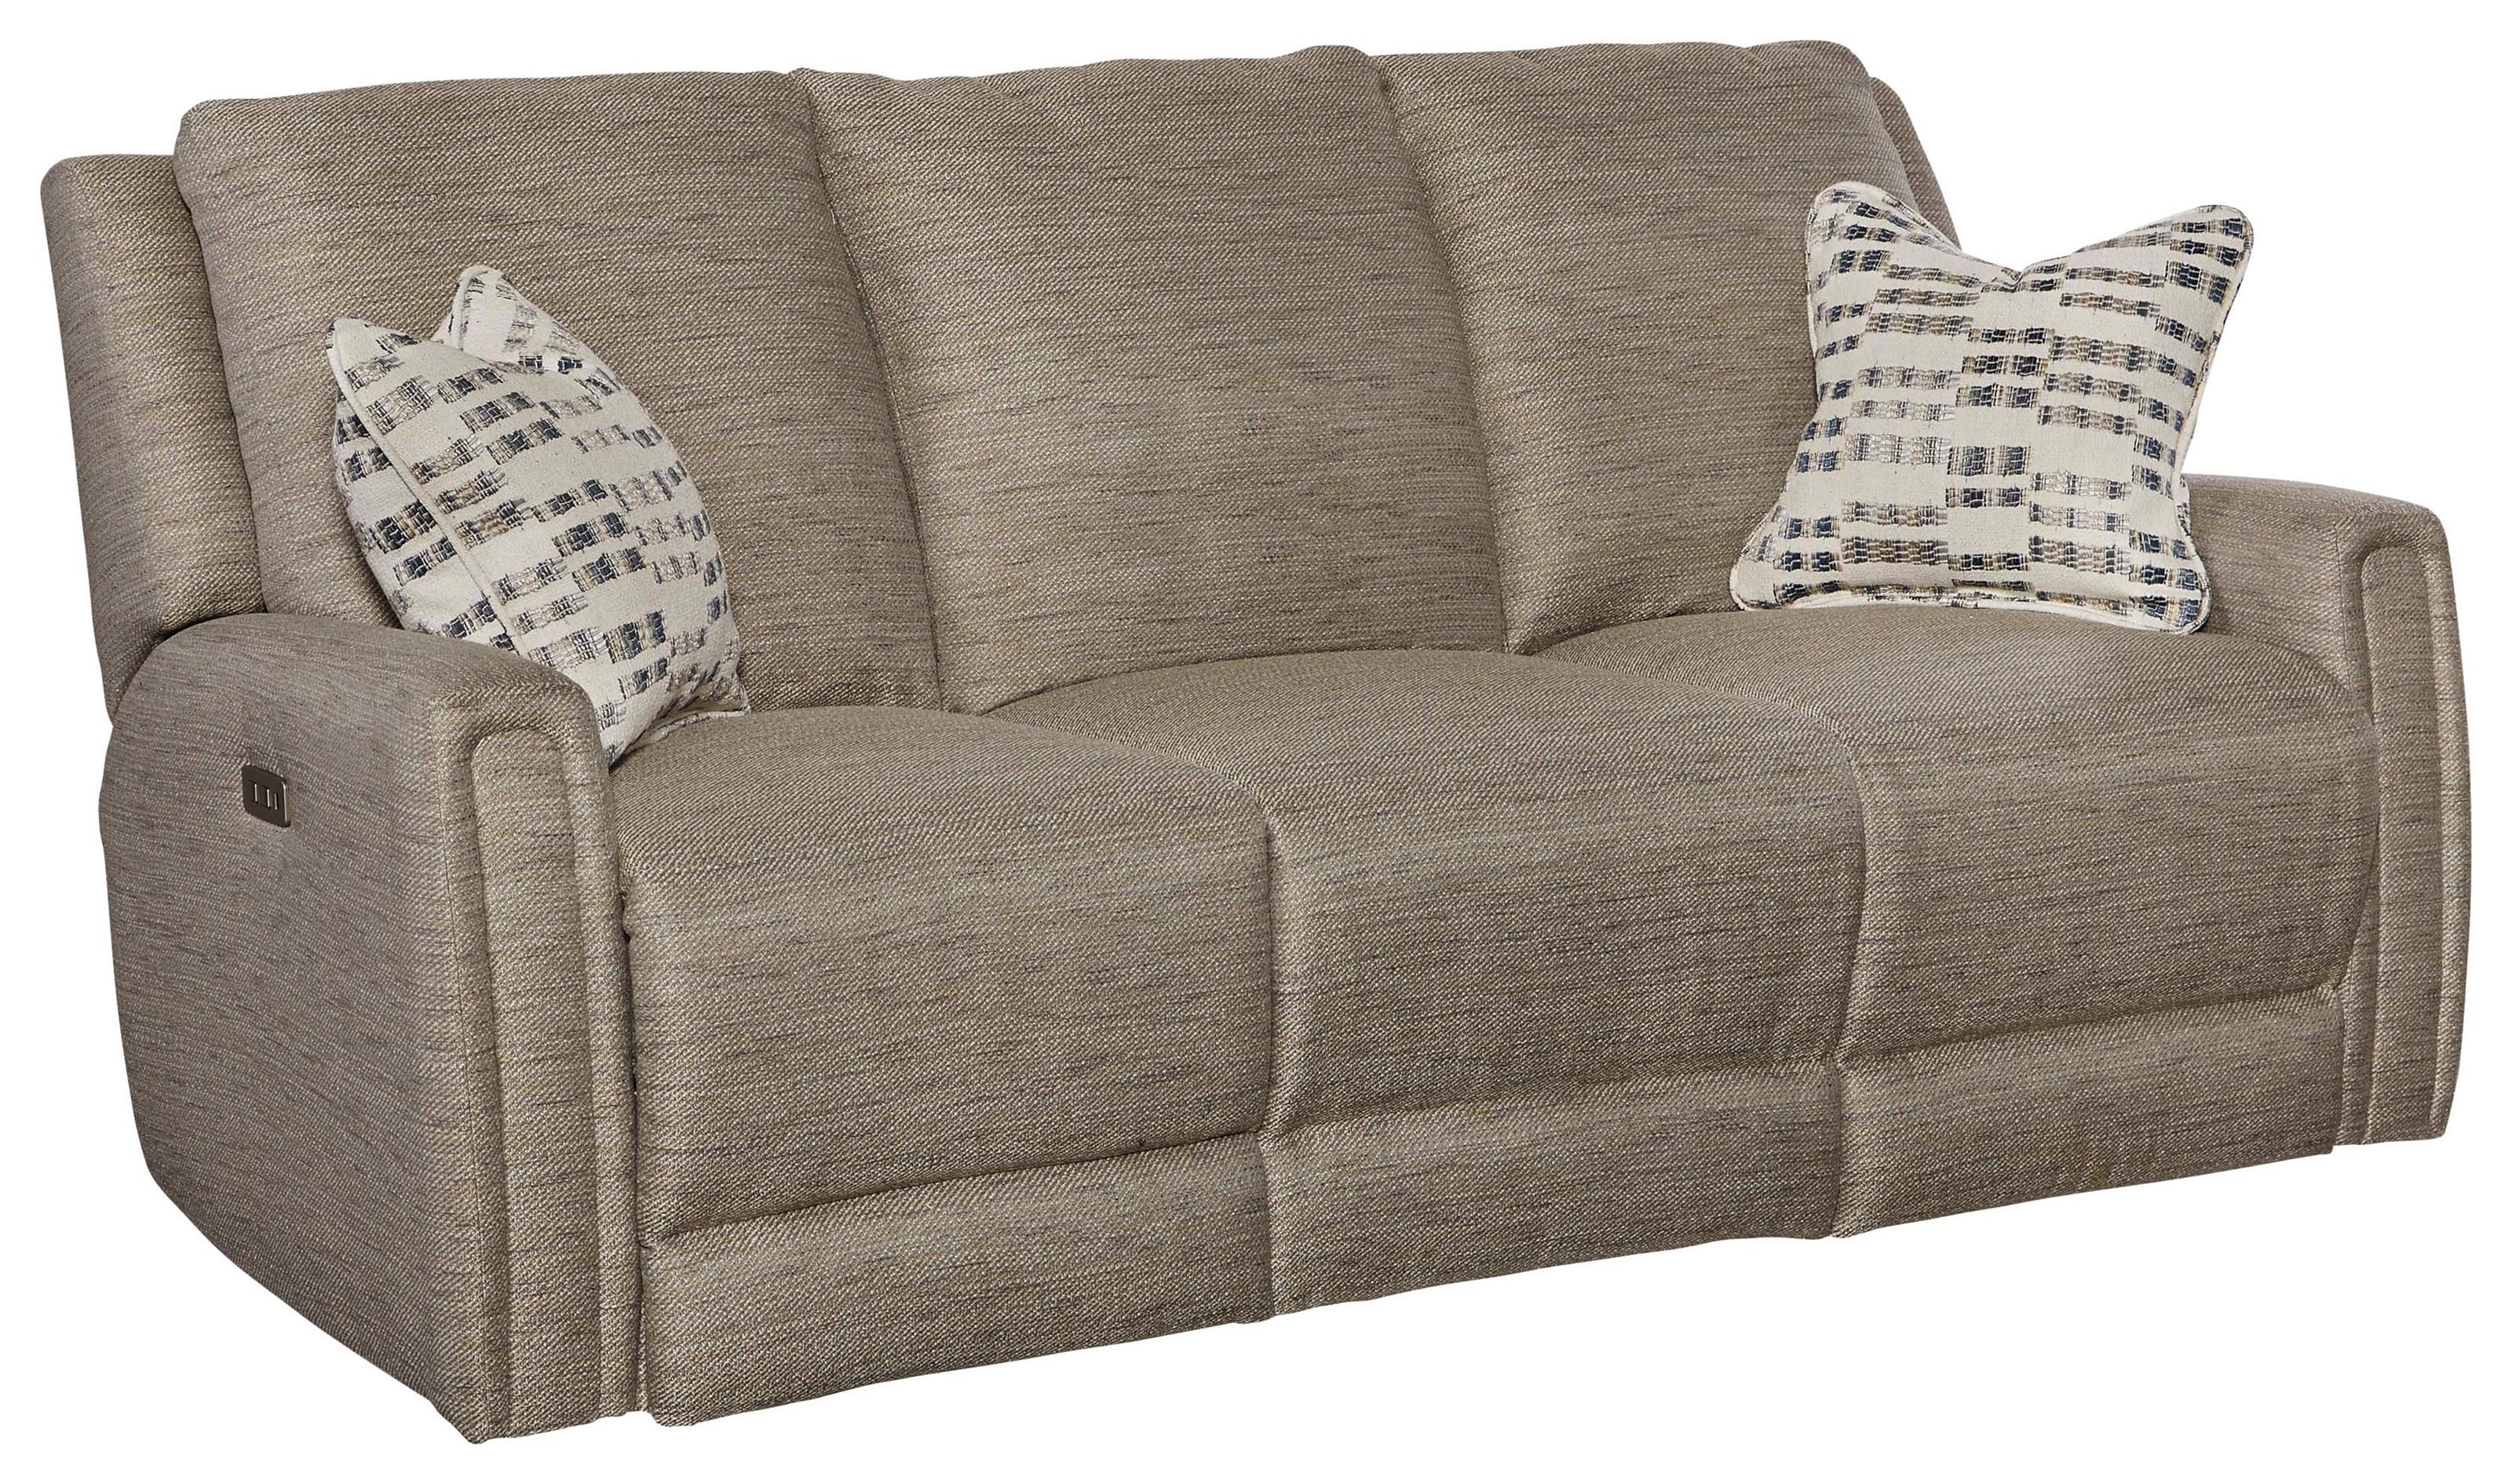 Wonderwall Power Sofa by Southern Motion at Johnny Janosik